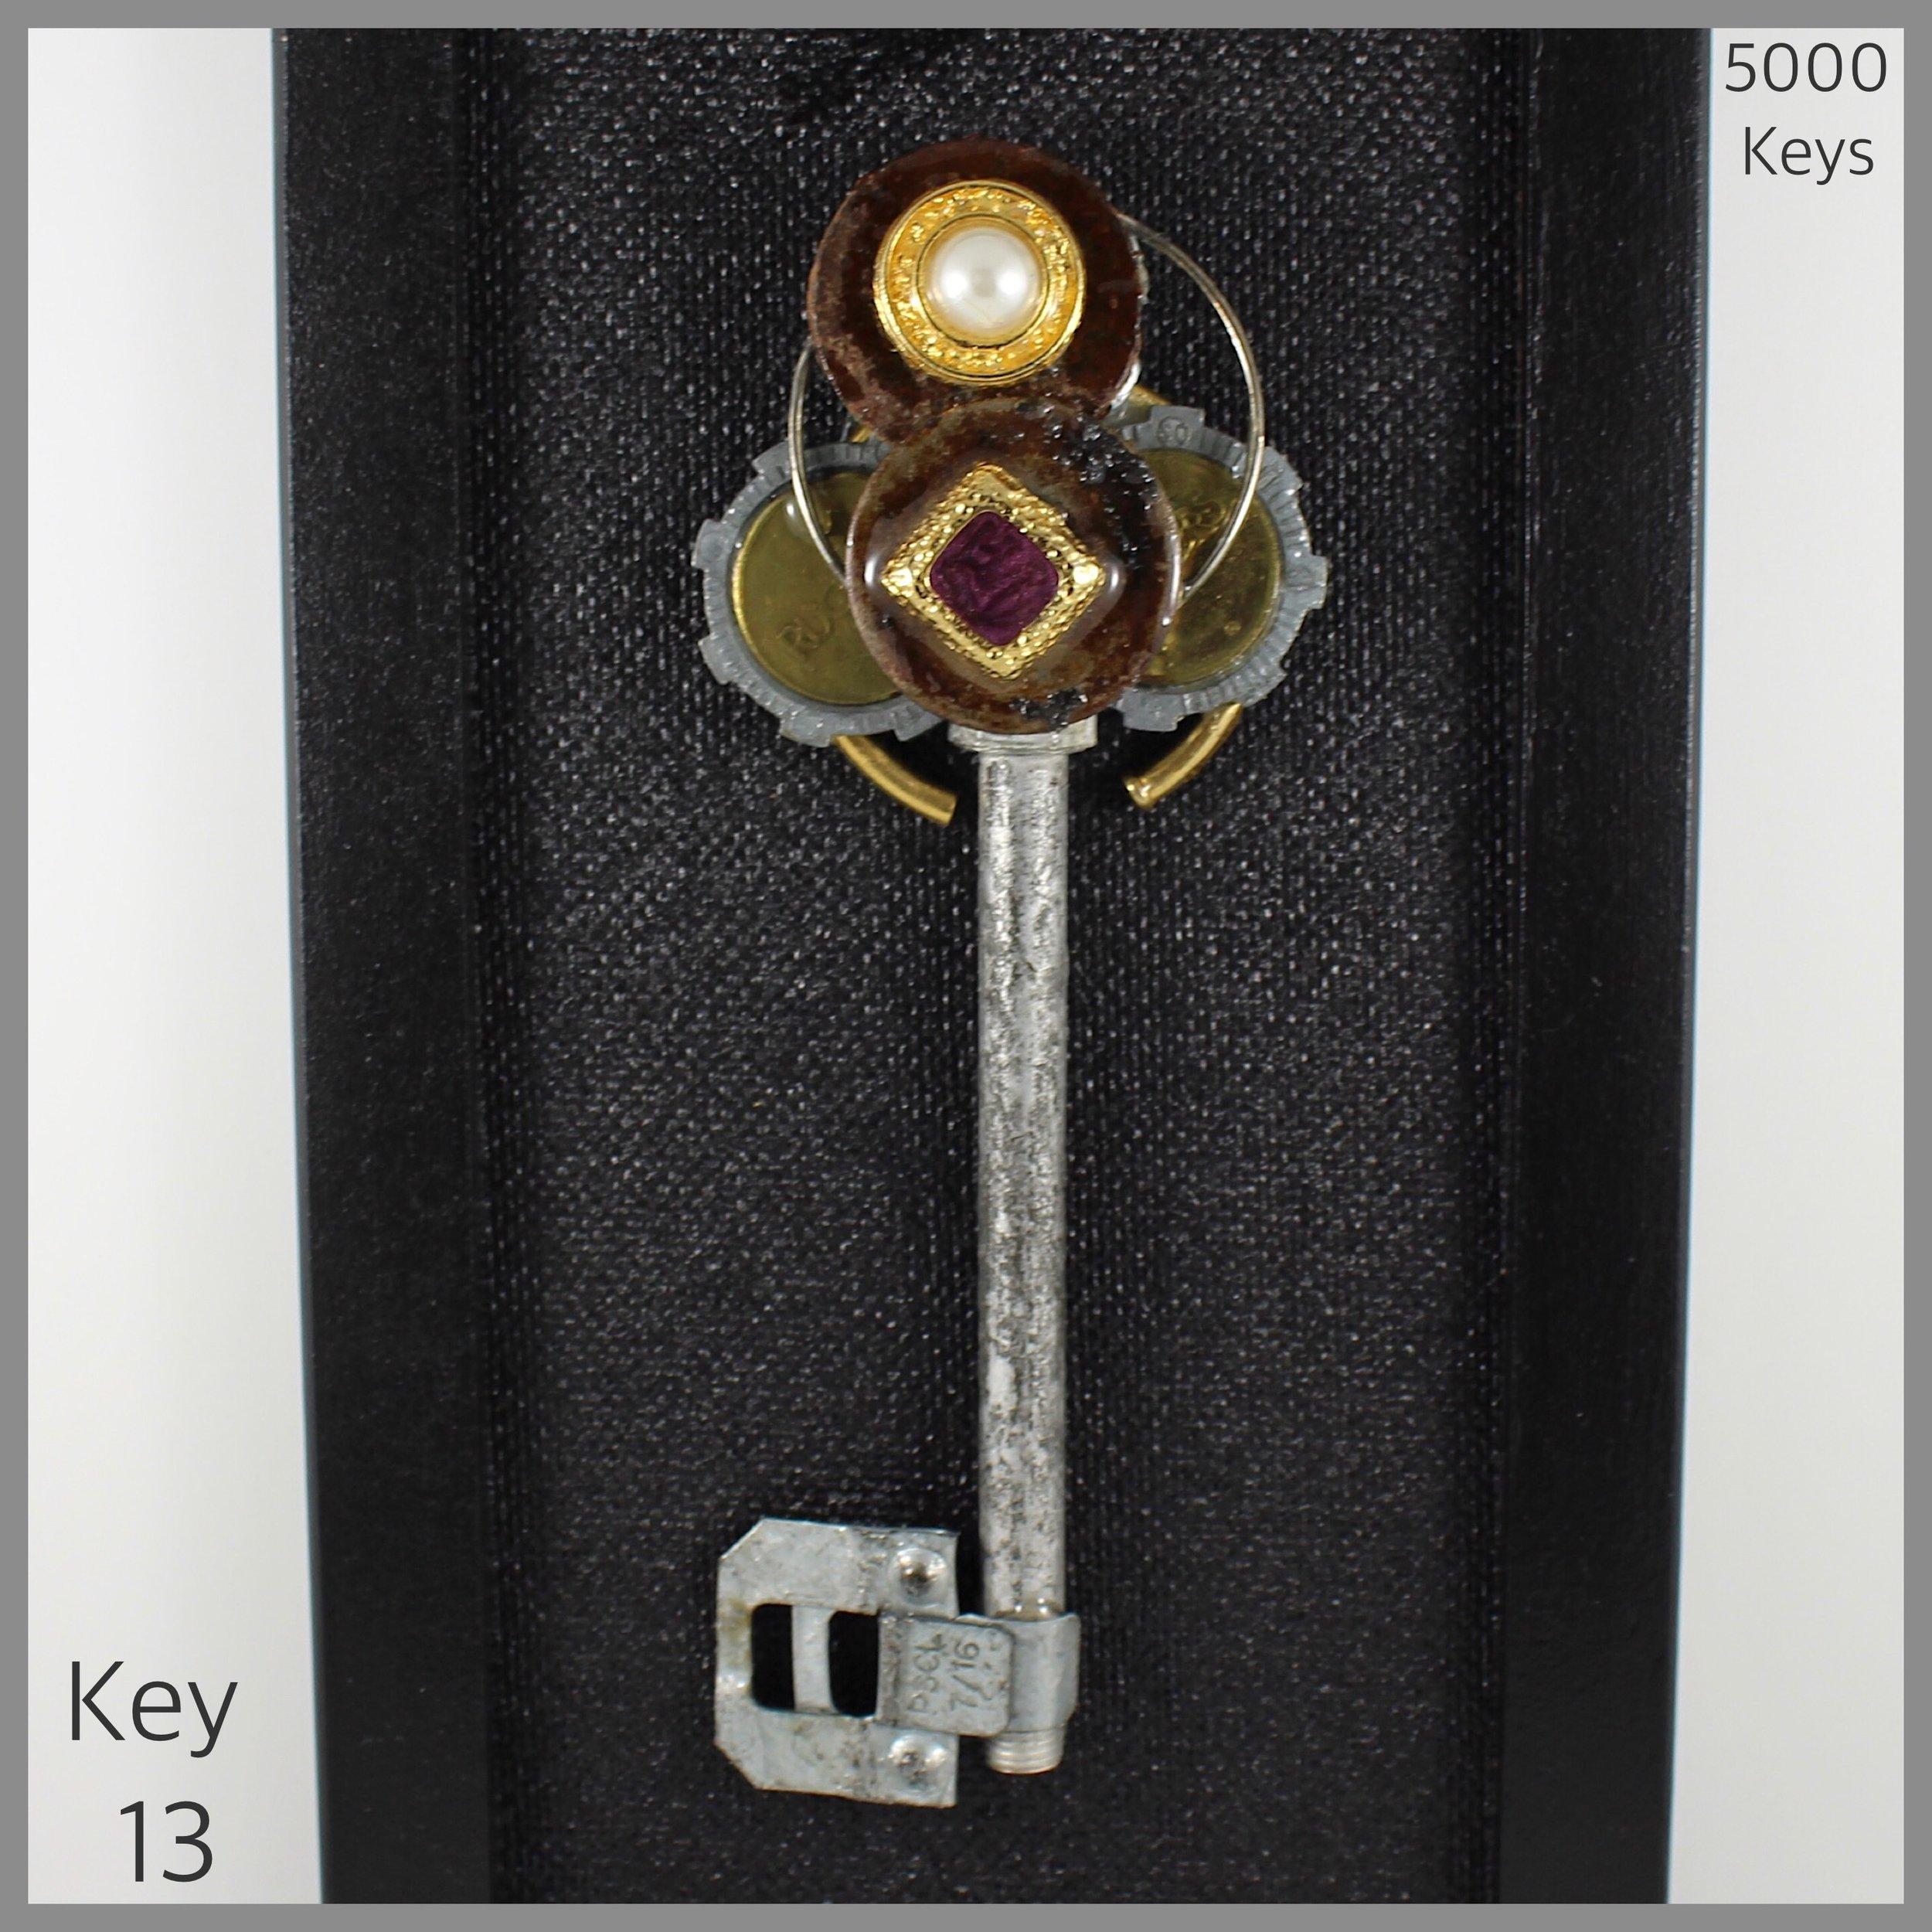 Key 13.JPG